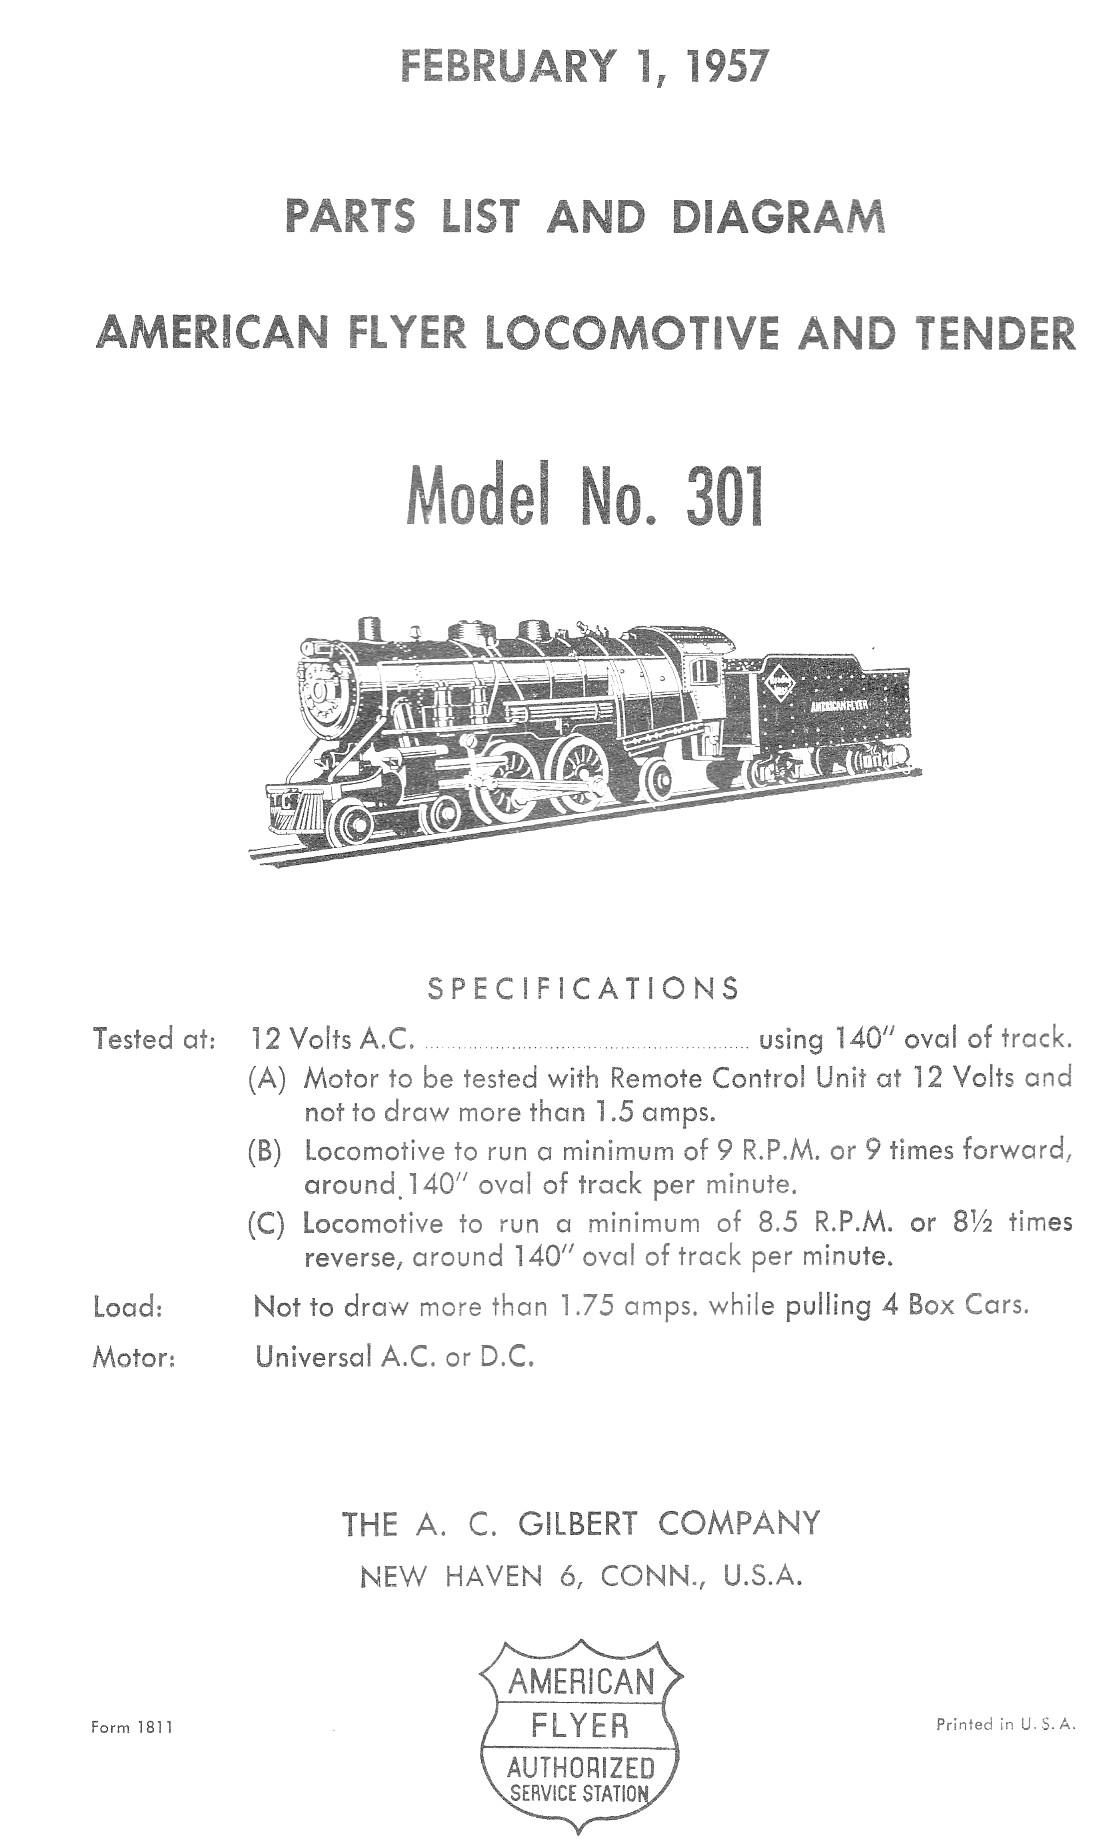 American Flyer Locomotive 301 Parts List and Diagram - Page 1